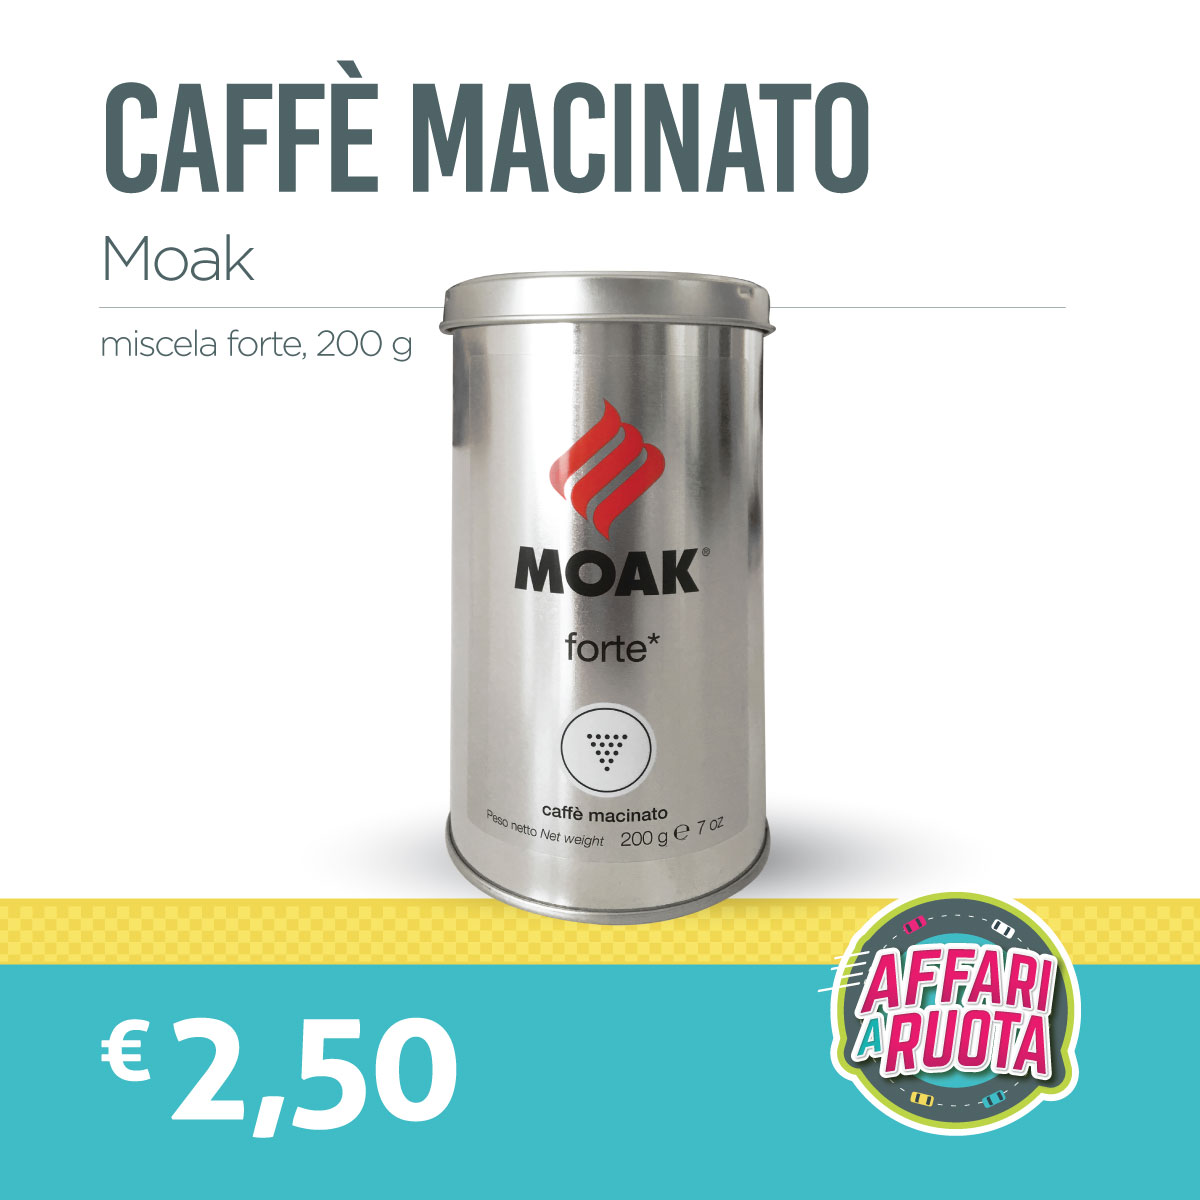 Caffè macinato Moak